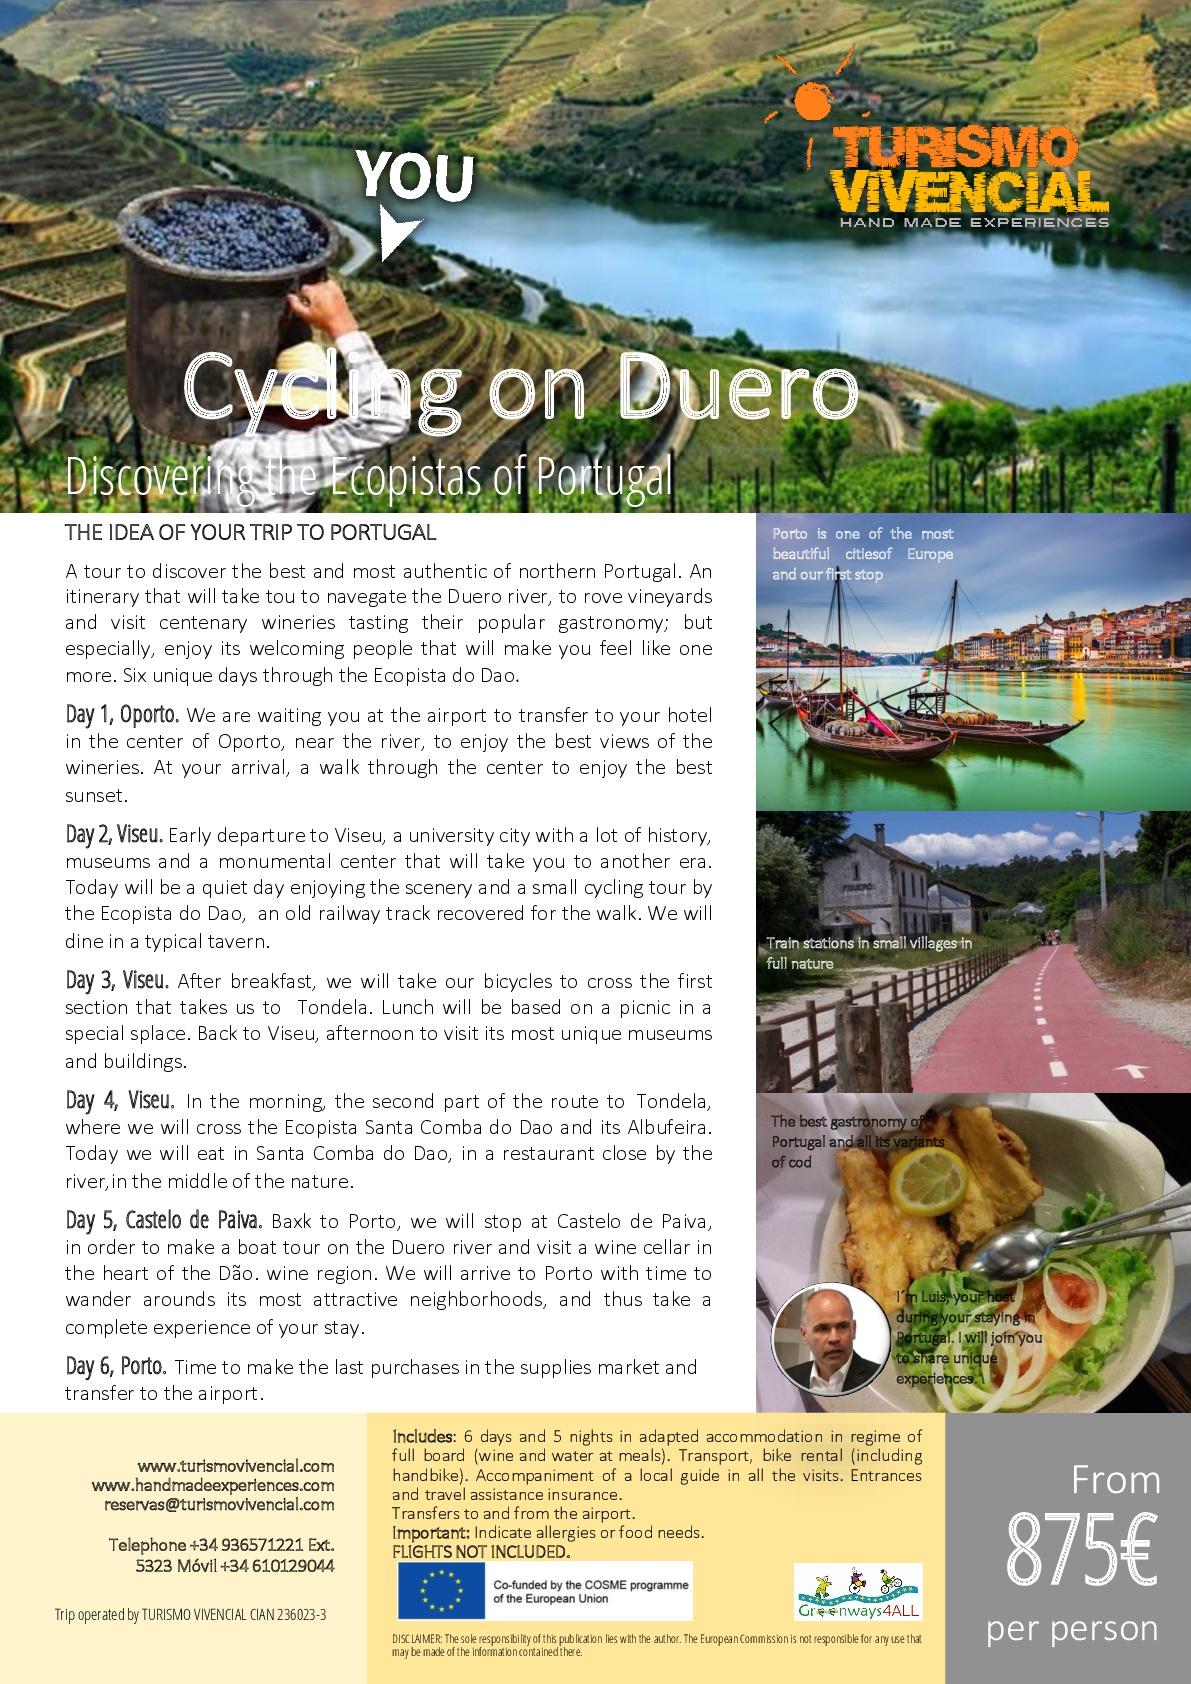 CYCLING ON DUERO